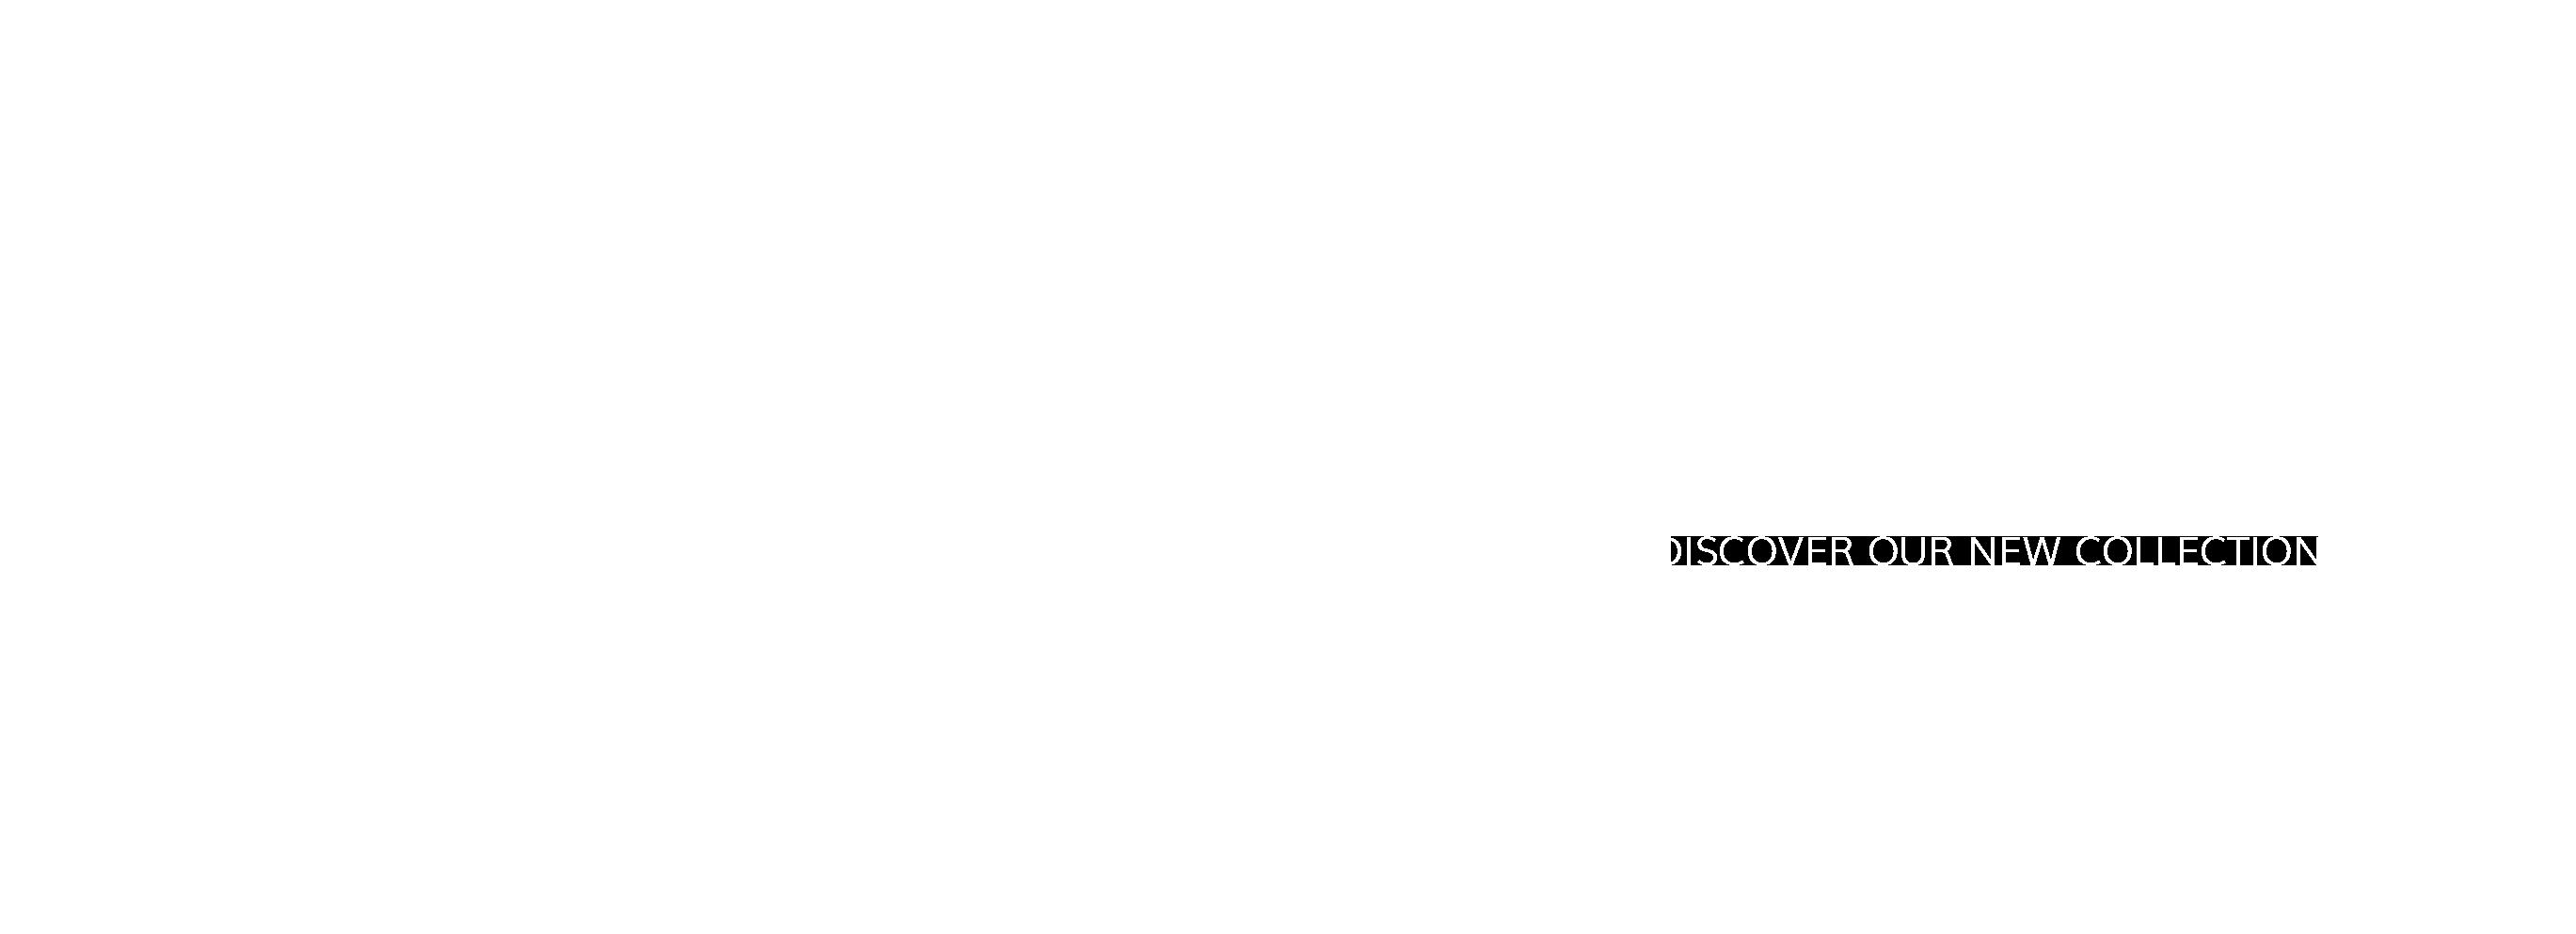 pasquini-calzature-headerhome17-eng